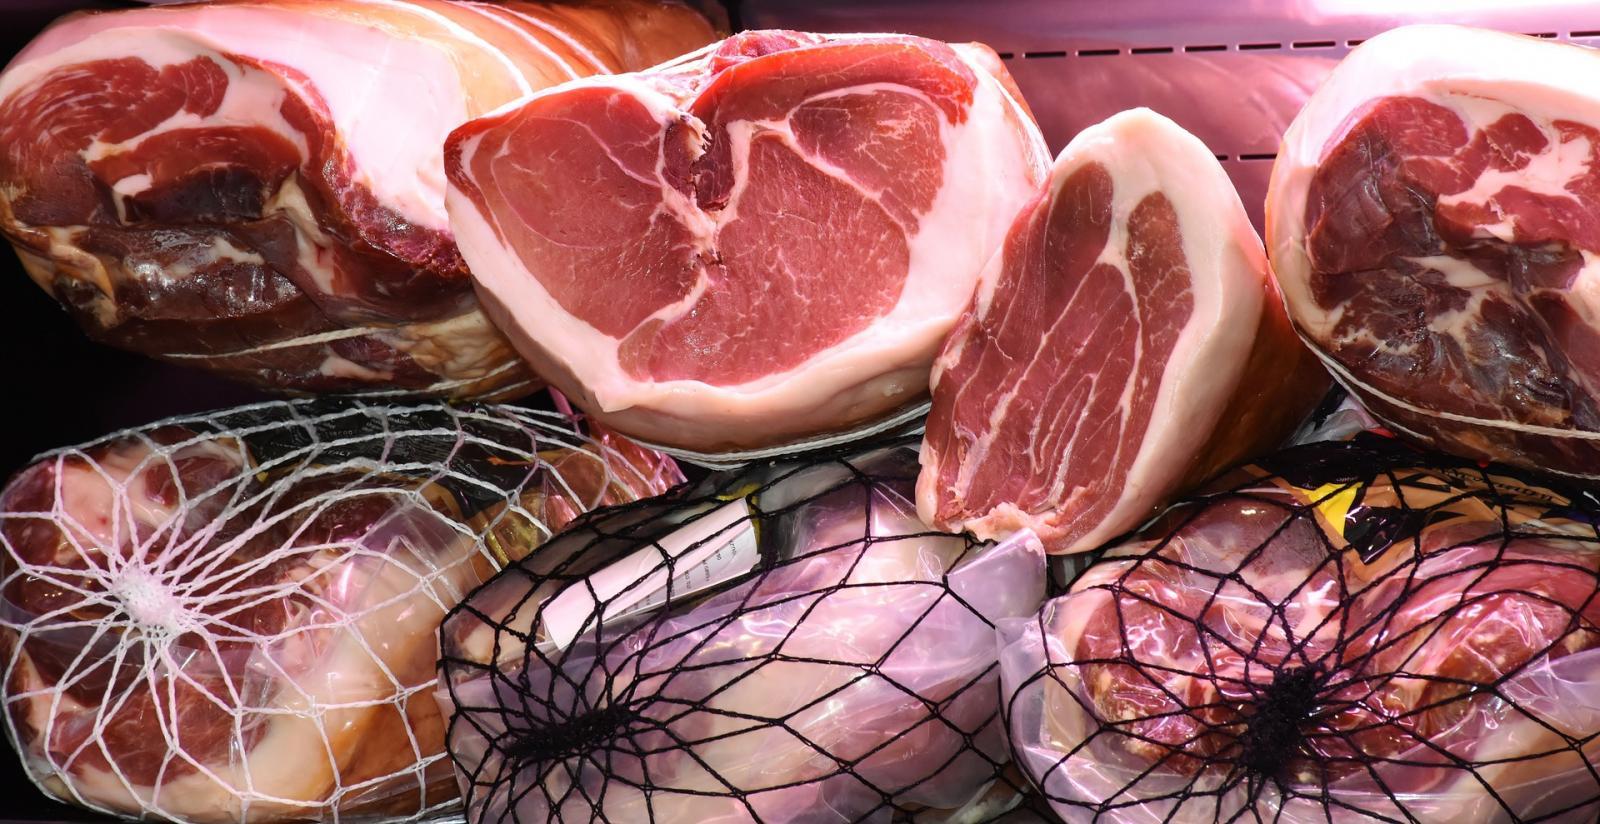 Hams on sale. Photo credit: pixabay